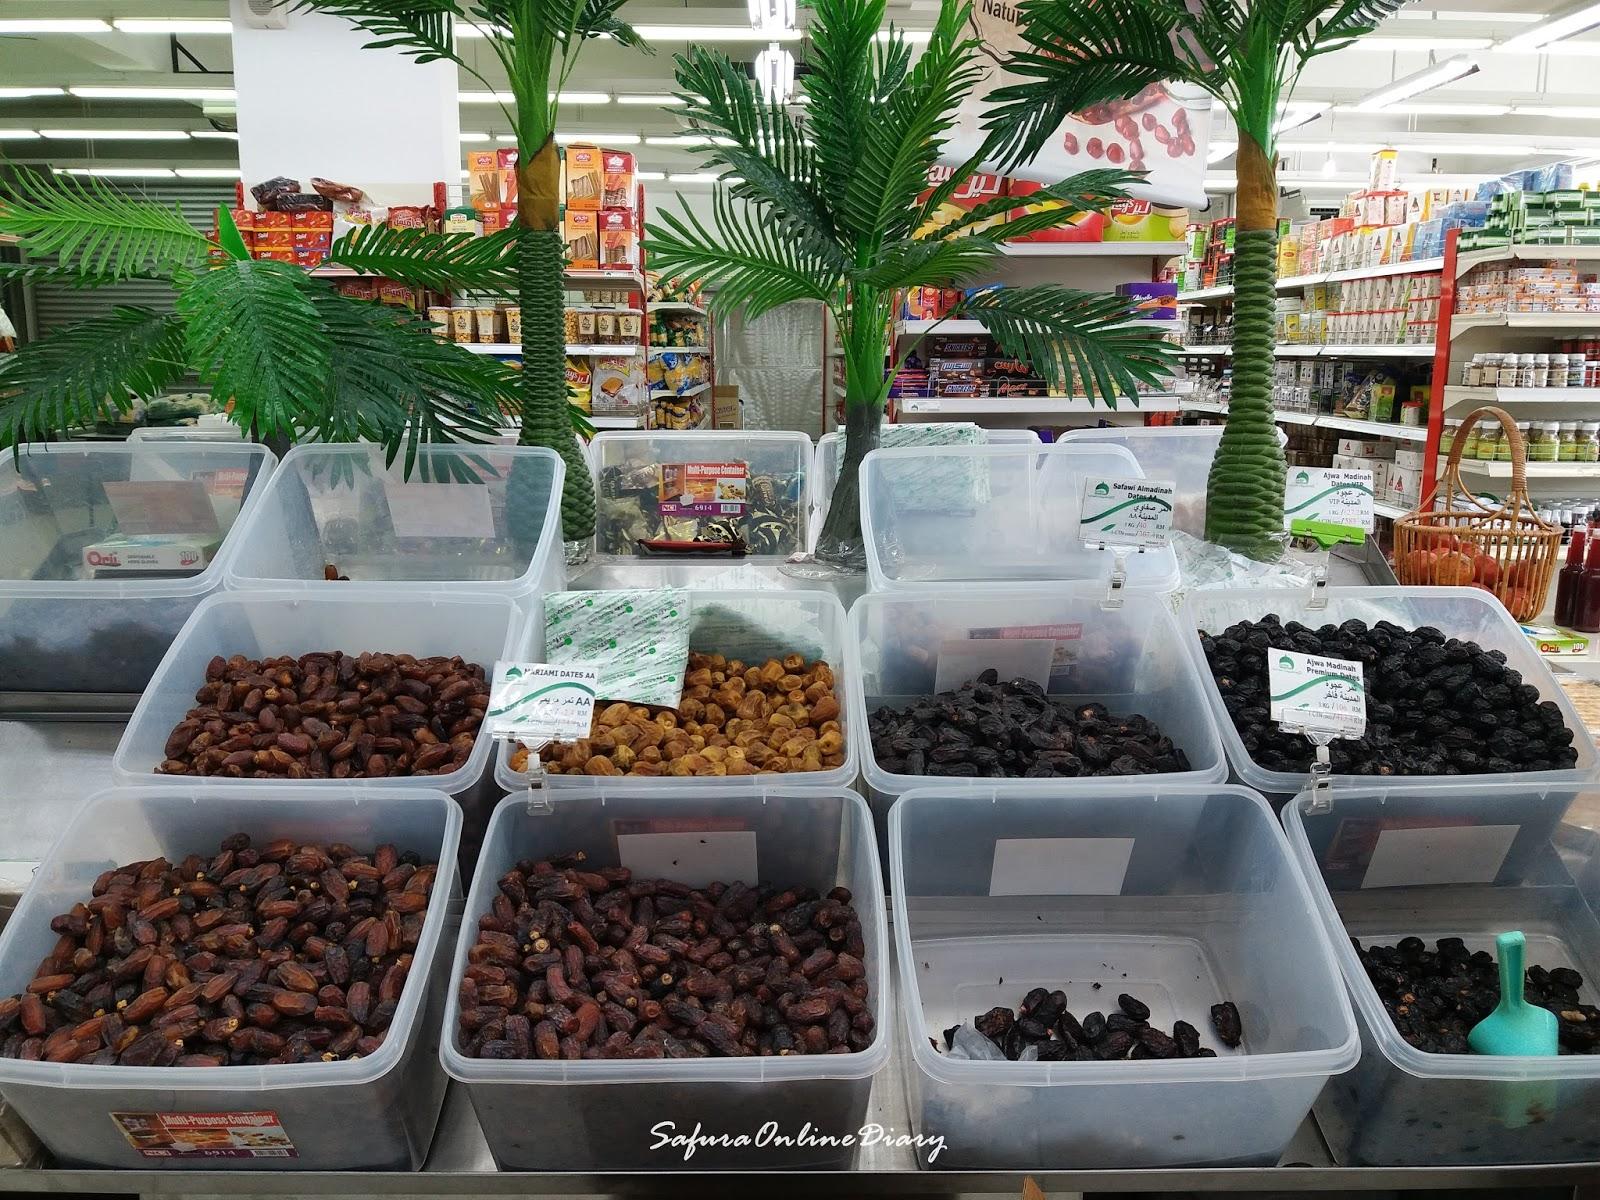 Berkat Madinah Kajang Kedai Arab Untuk Orang Kajang Safura